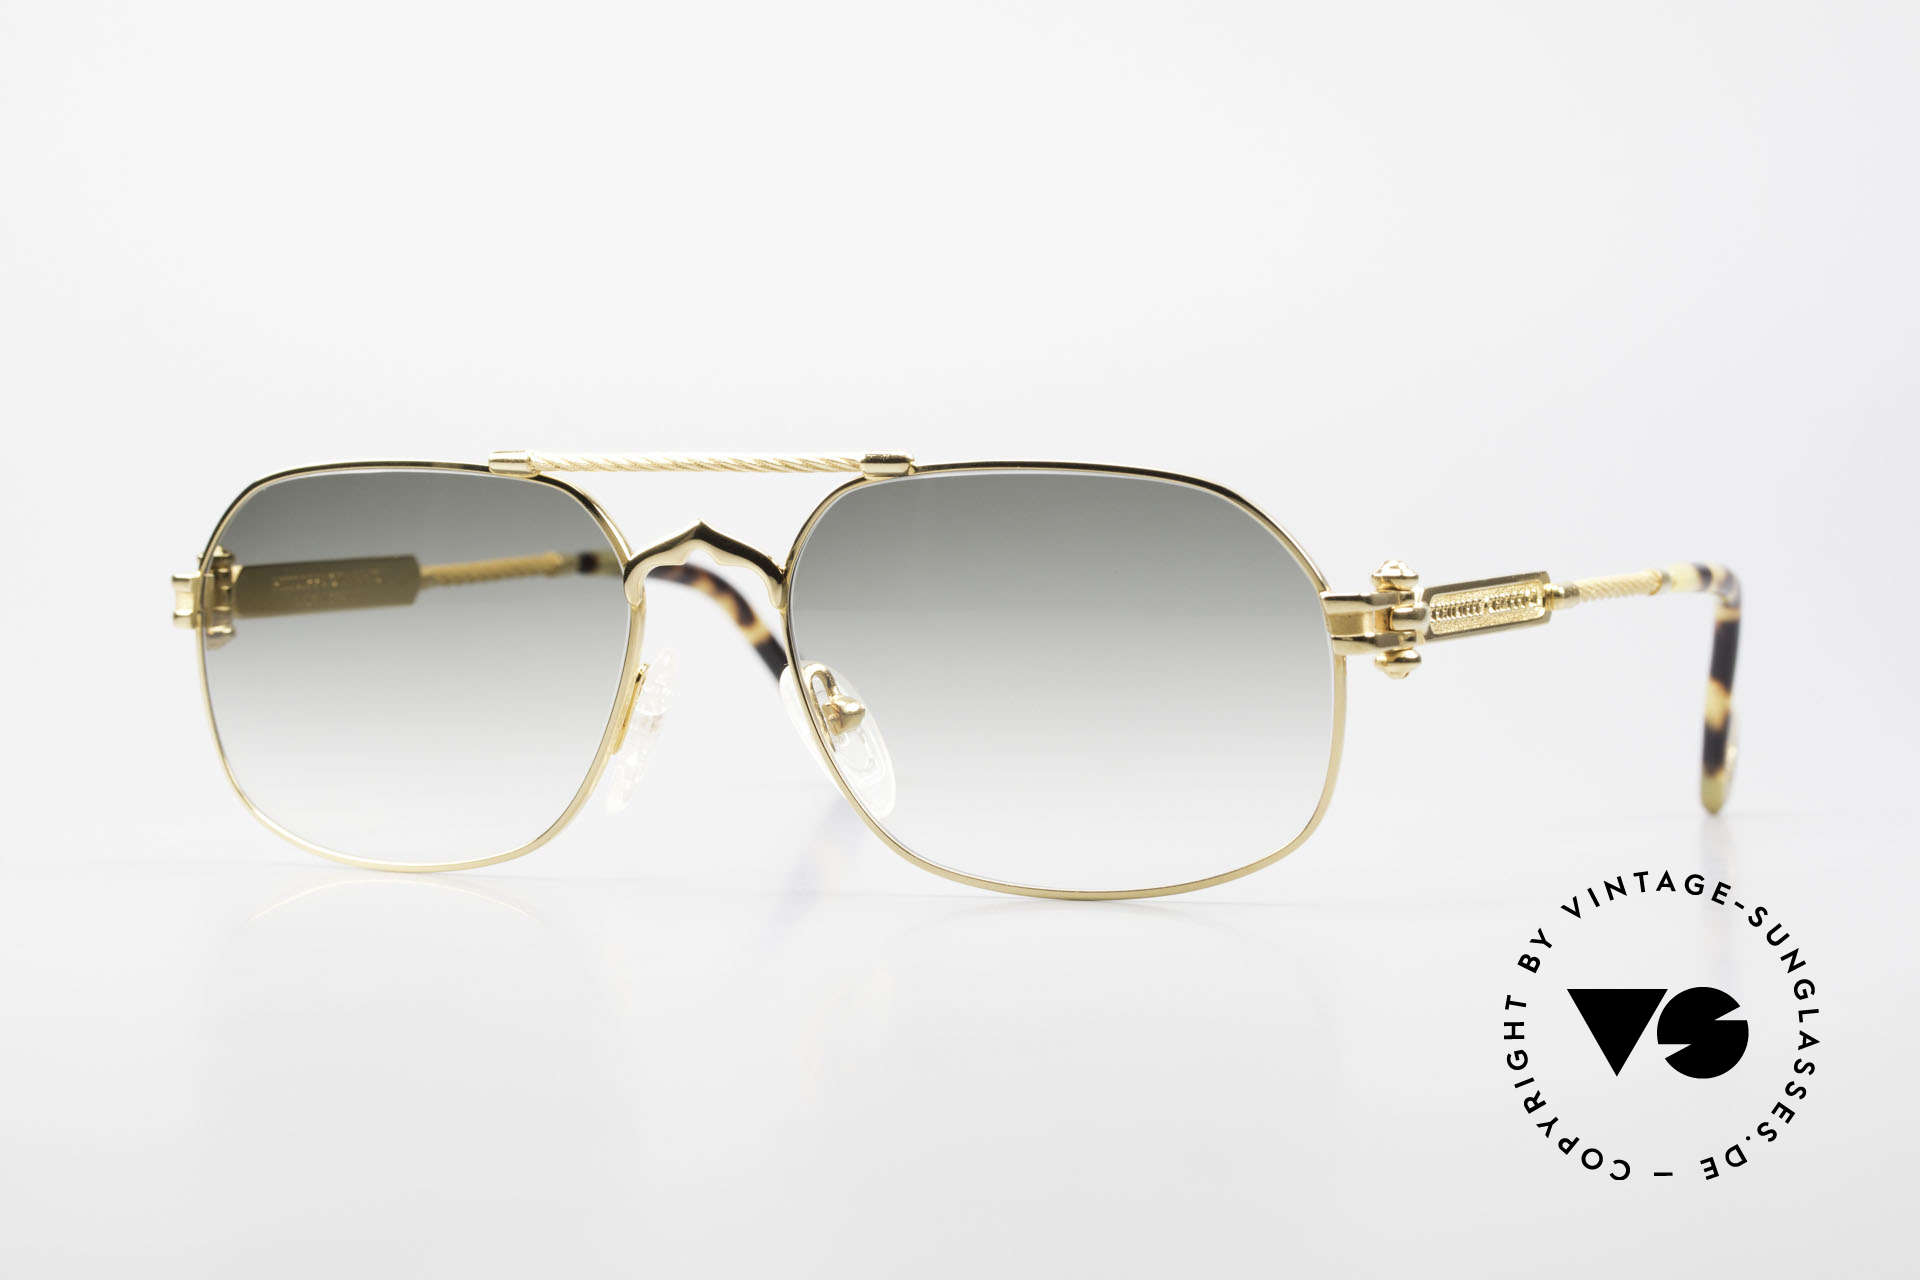 Philippe Charriol 90PP Insider 80's Luxury Sunglasses, square 80's insider sunglasses for all lovers of luxury, Made for Men